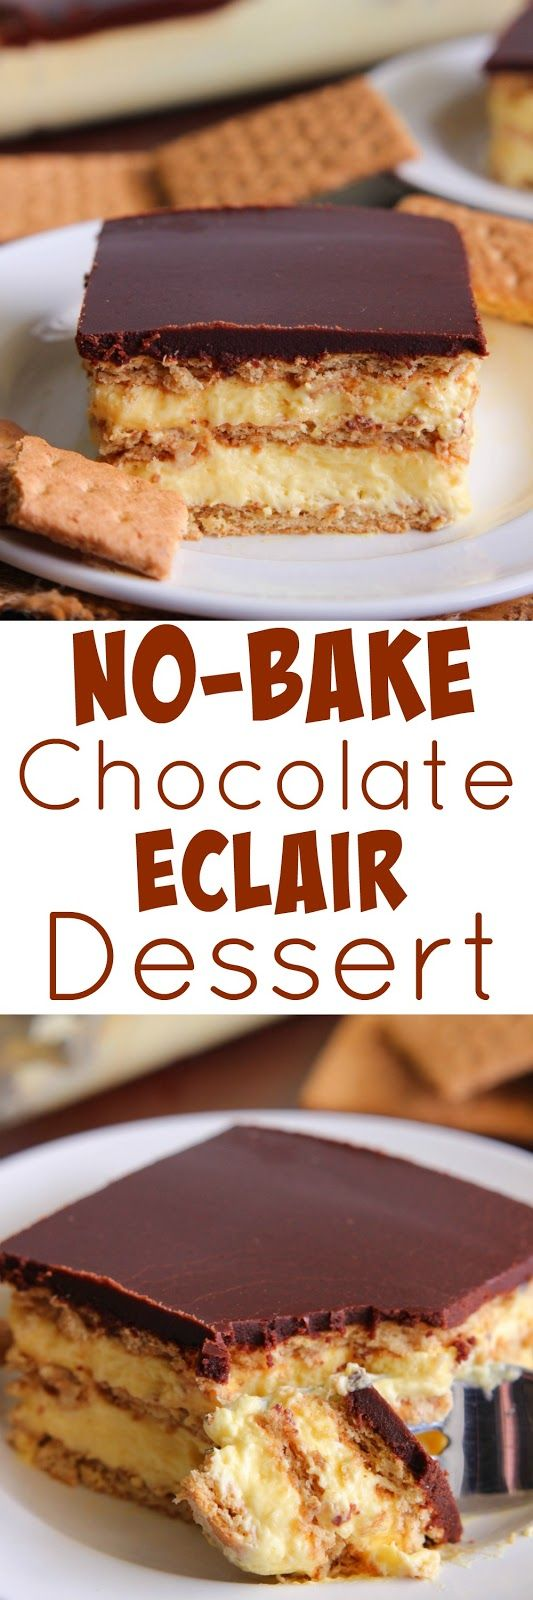 Eat Cake For Dinner: No-Bake Chocolate Eclair Dessert